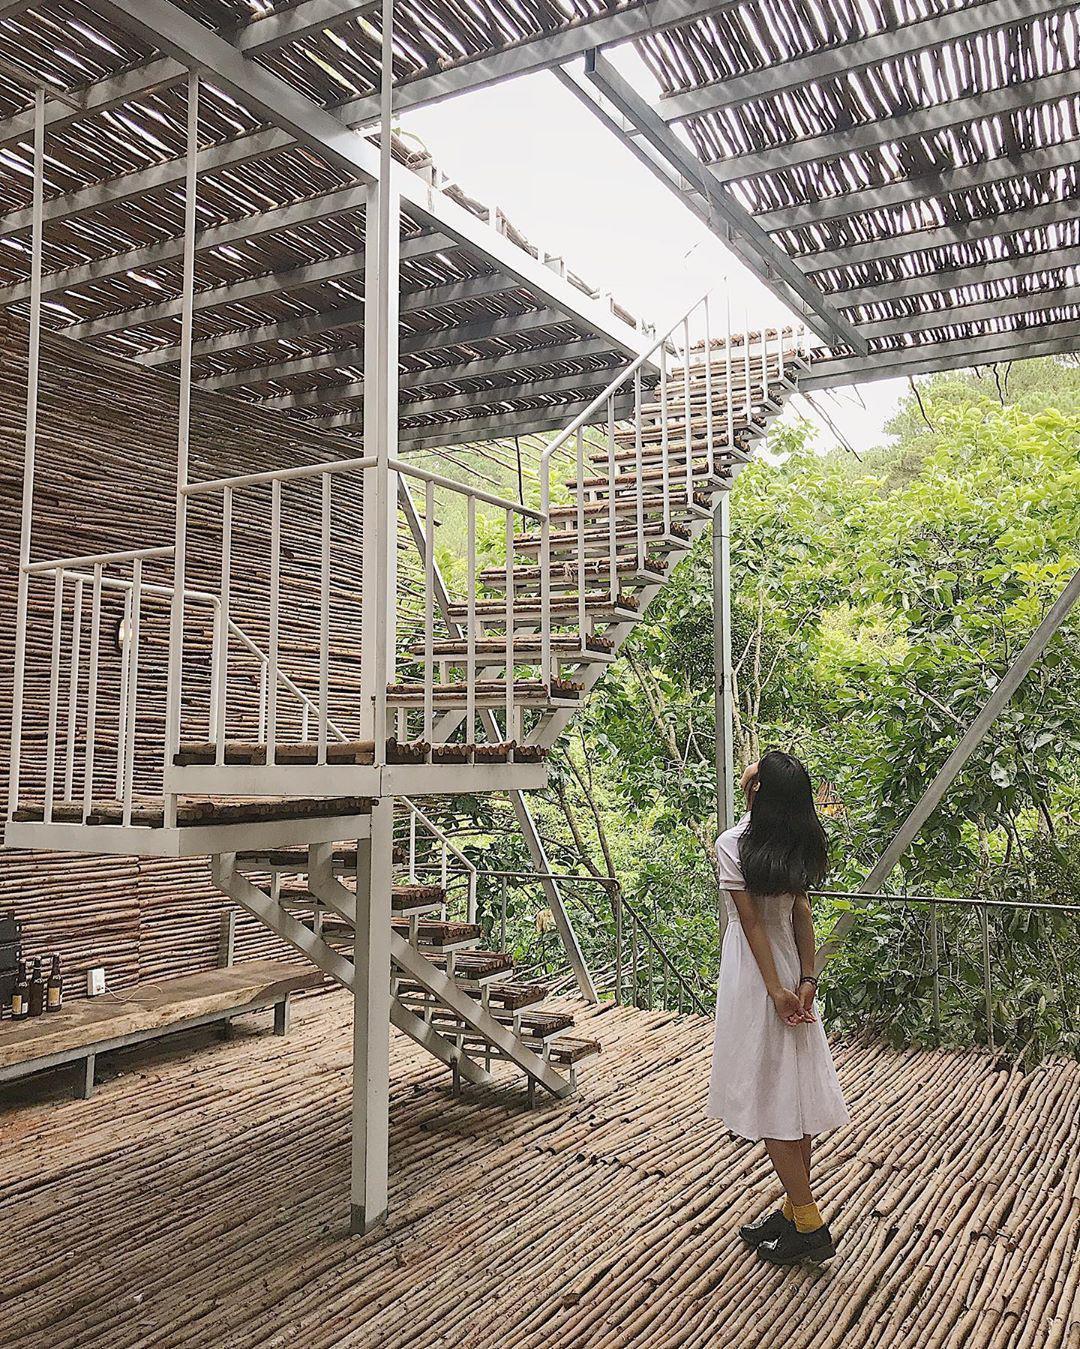 dalat_somehow-cabins-11